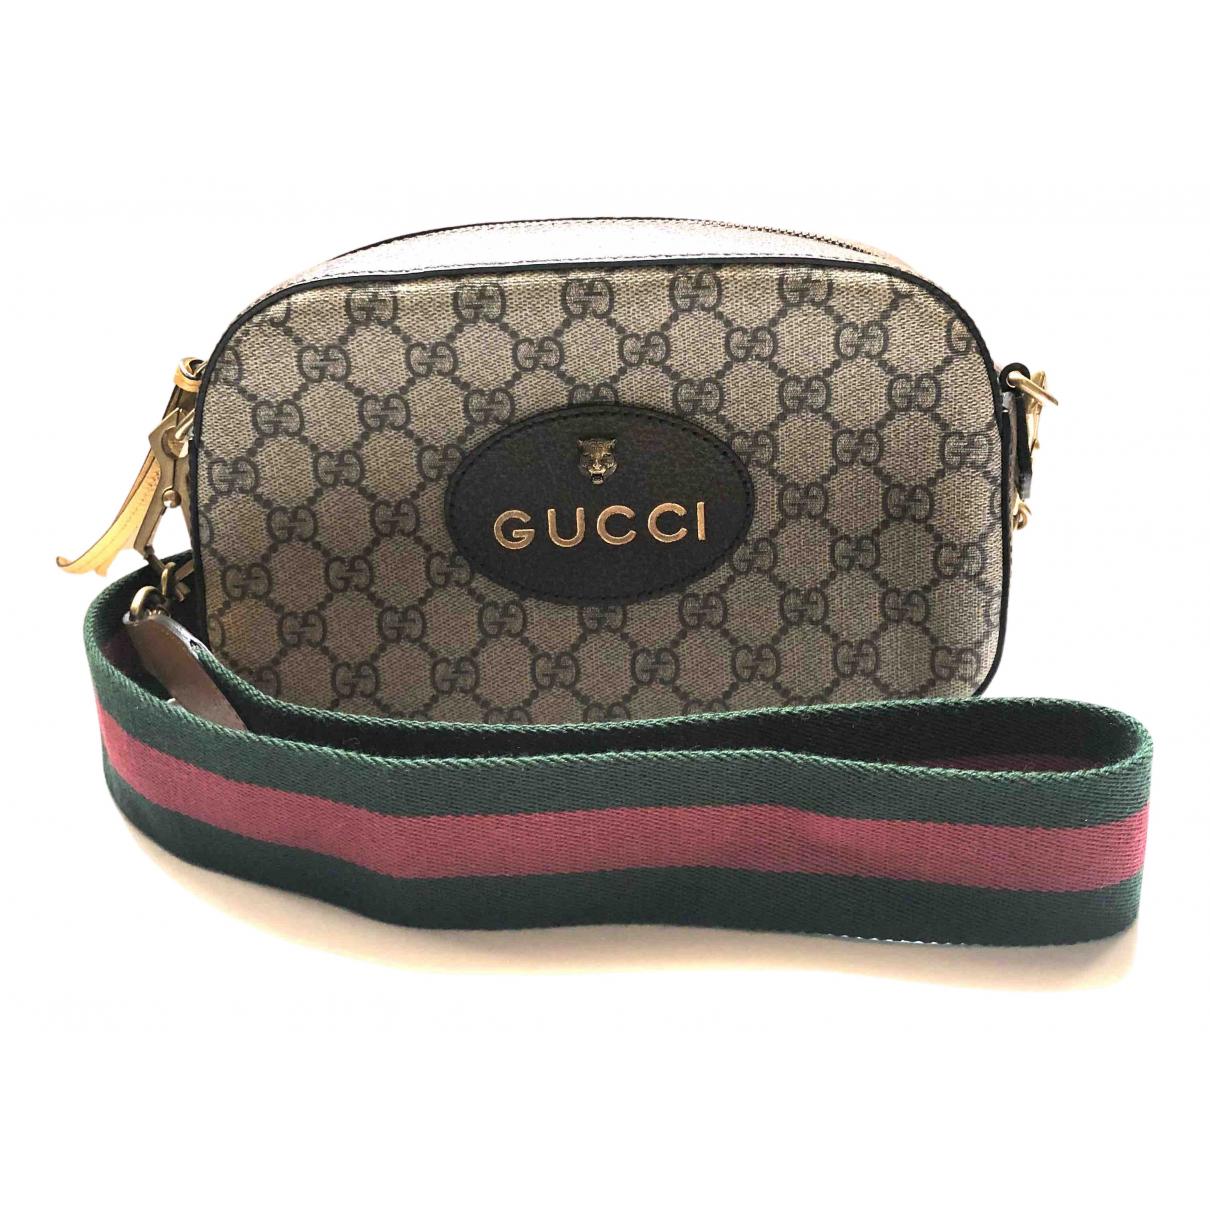 Gucci \N Clutch in  Beige Leinen